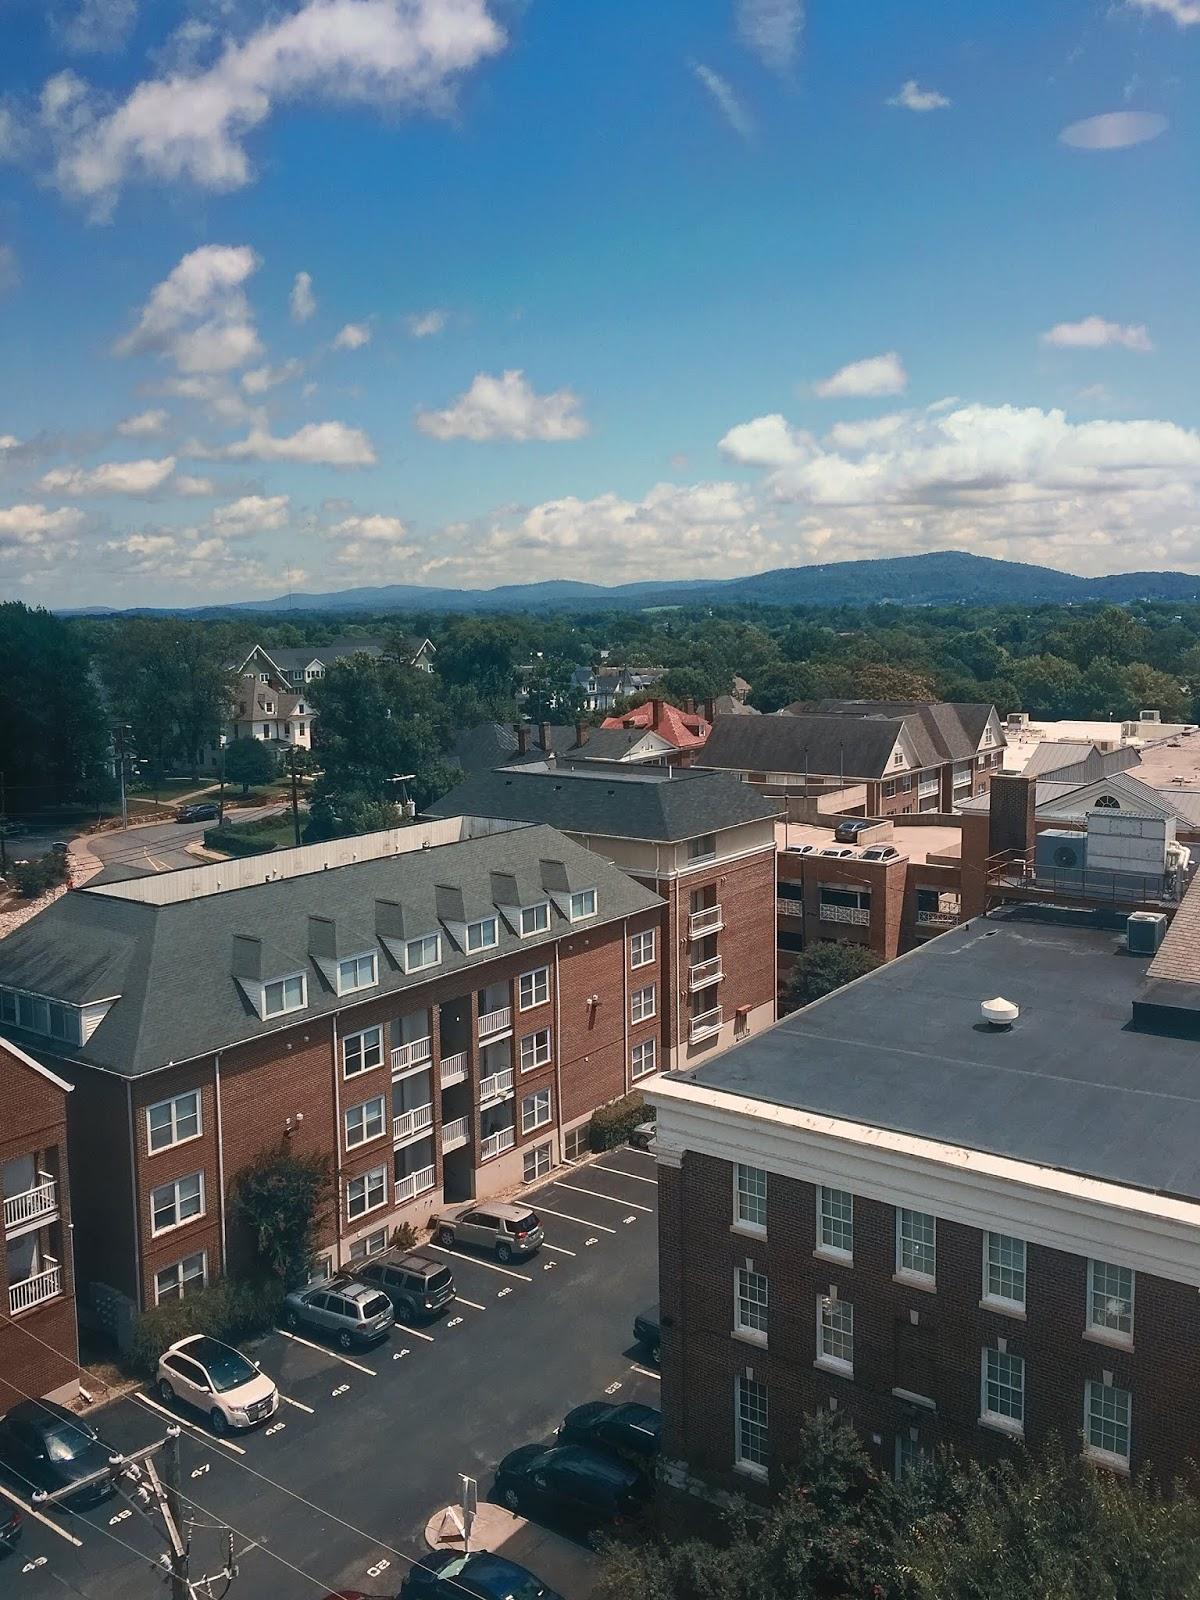 Graduate Charlottesville Experience by Mari Estilo.